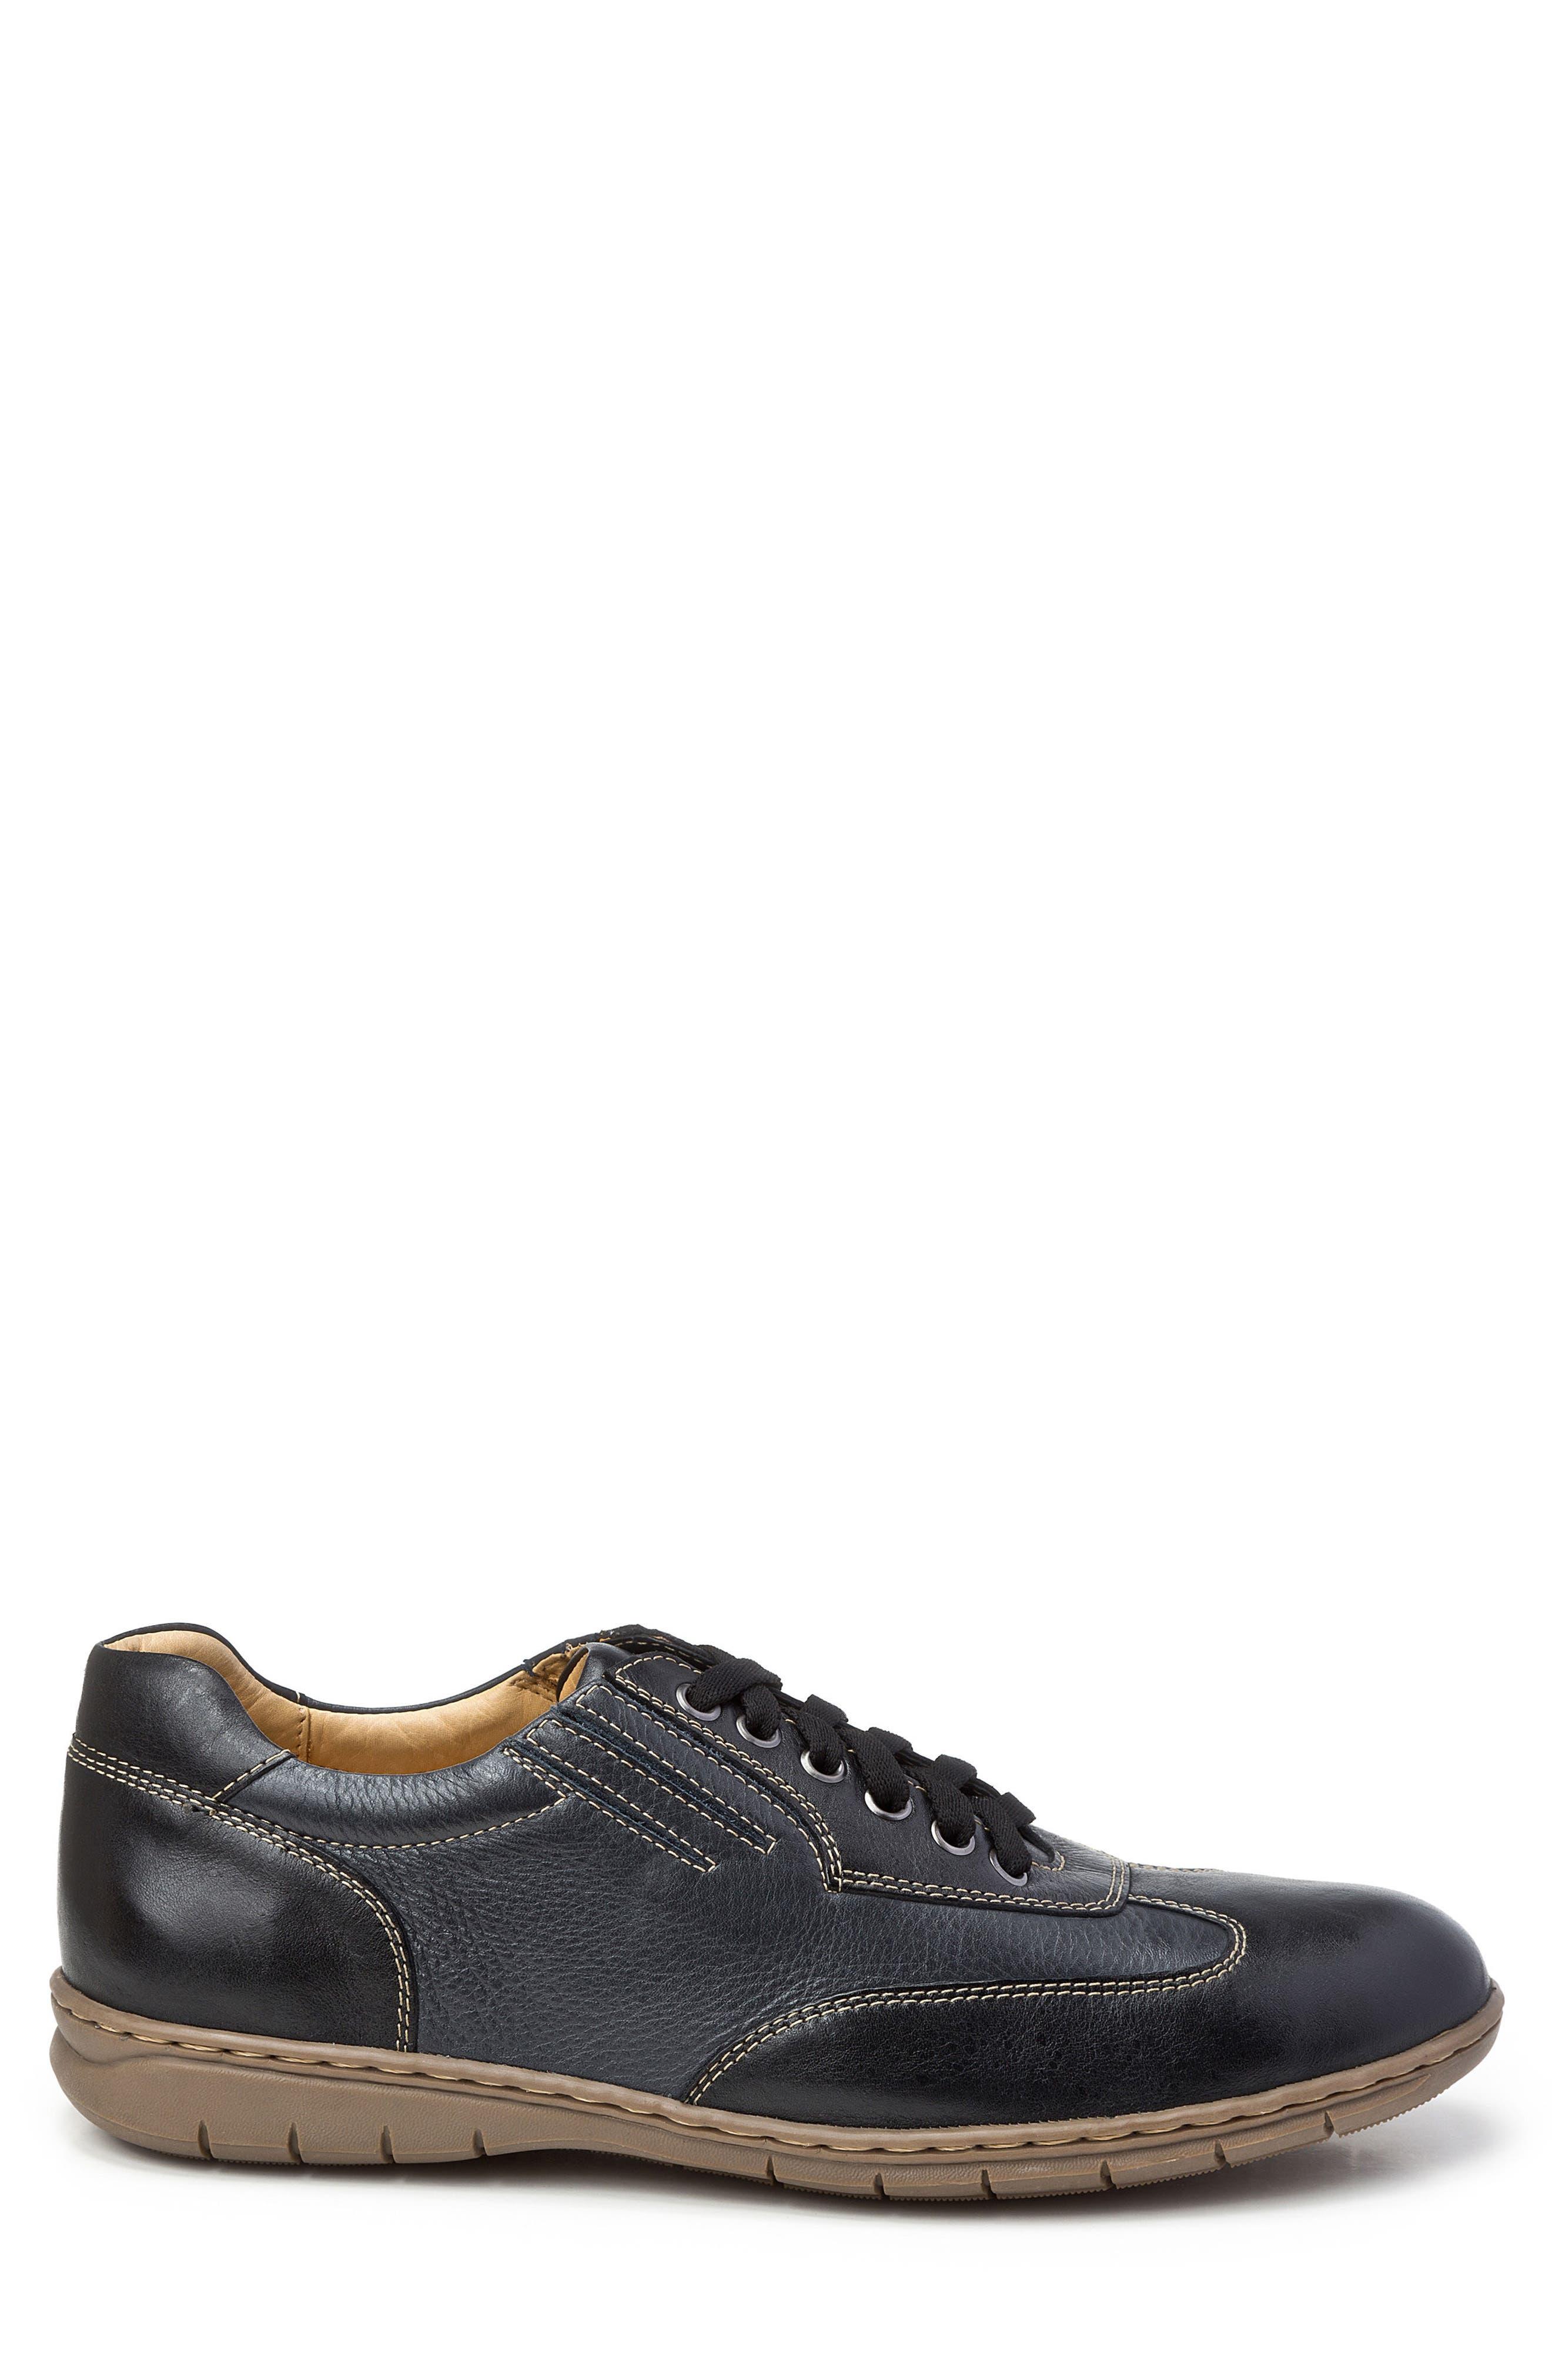 Vernon Sneaker,                             Alternate thumbnail 3, color,                             Black Leather